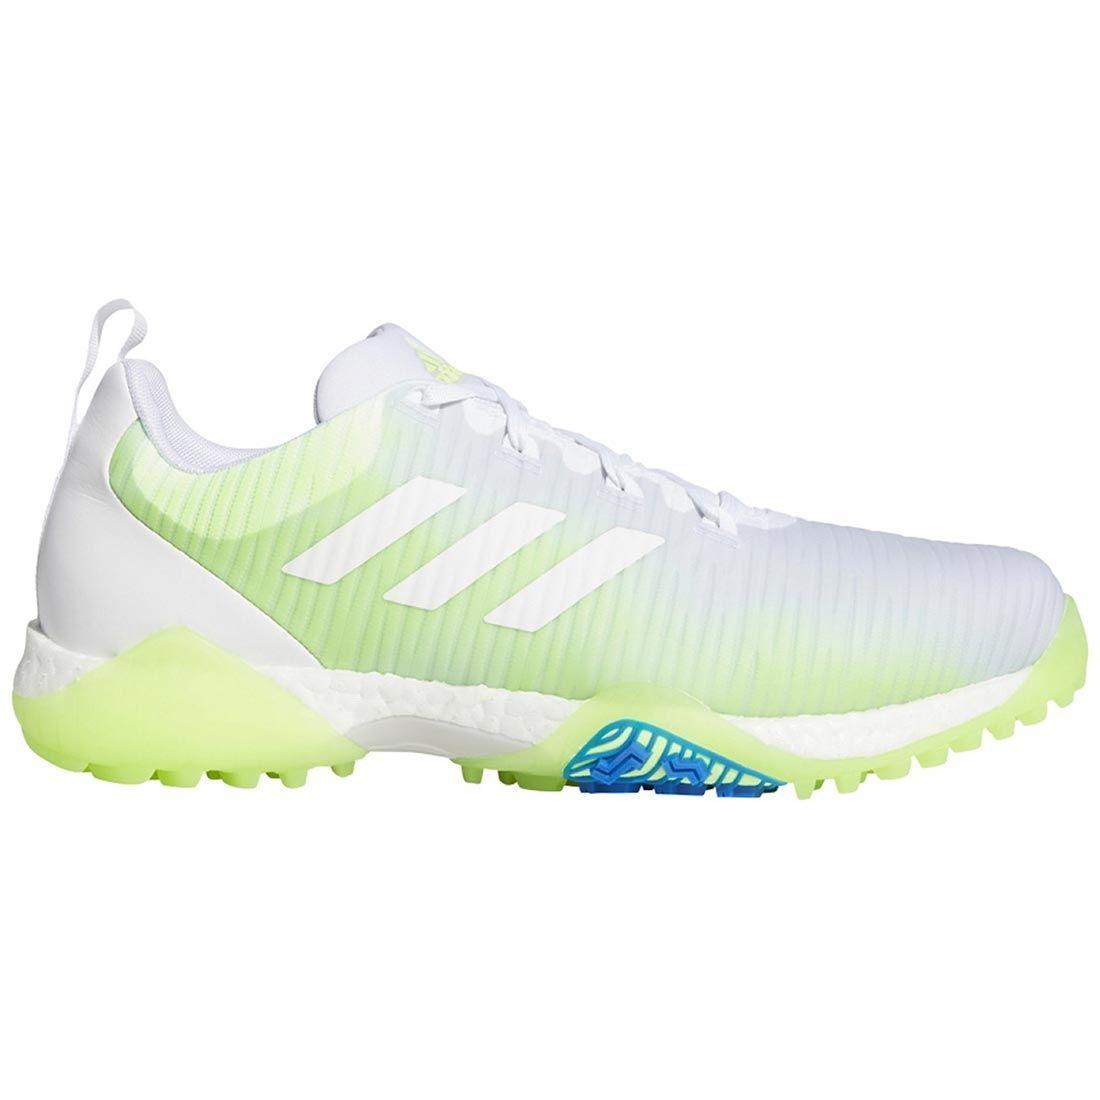 Buy Adidas Codechaos Golf Shoes White Signal Green Golf Discount